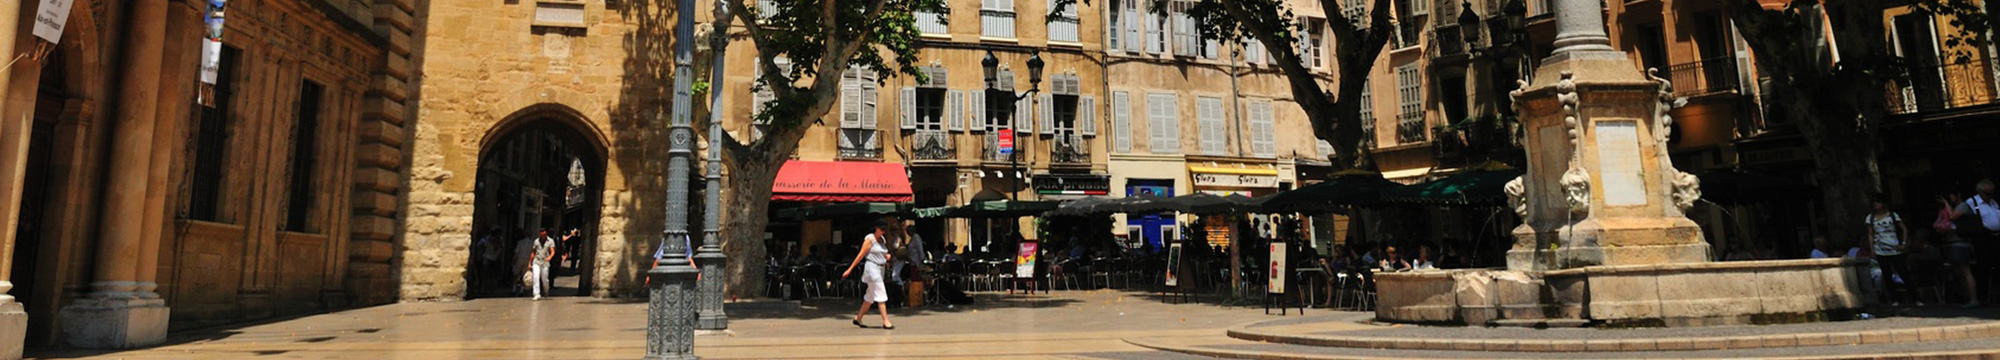 Alternance Azur – Aix-en-provence